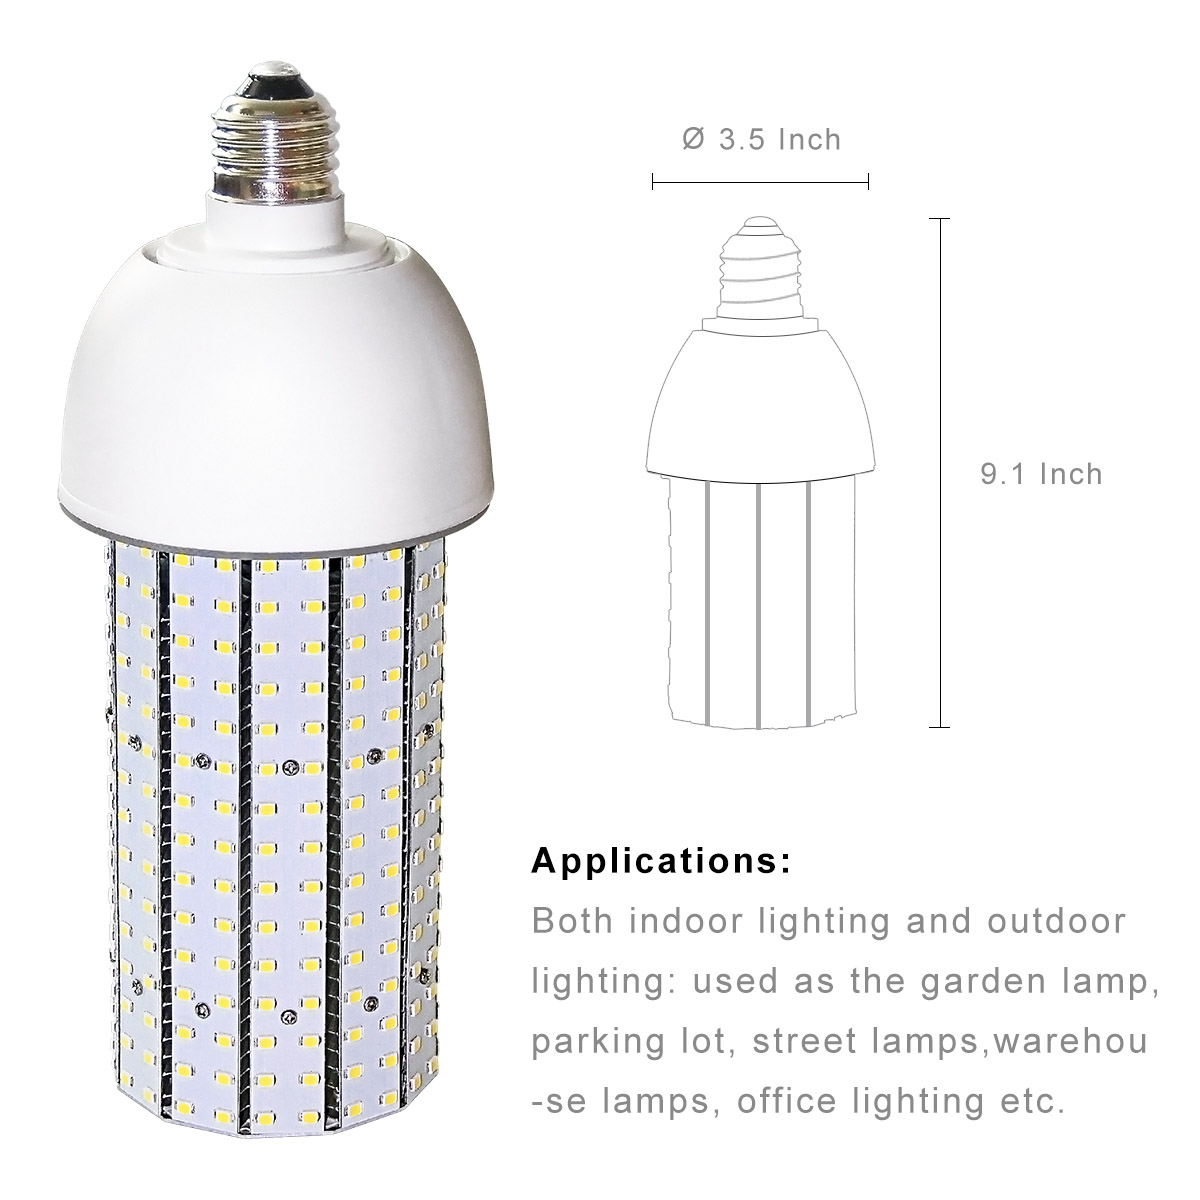 Kawell 40w Led Corn Light Bulb E39 Mogul Screw Base Street Wiring A Lamp For